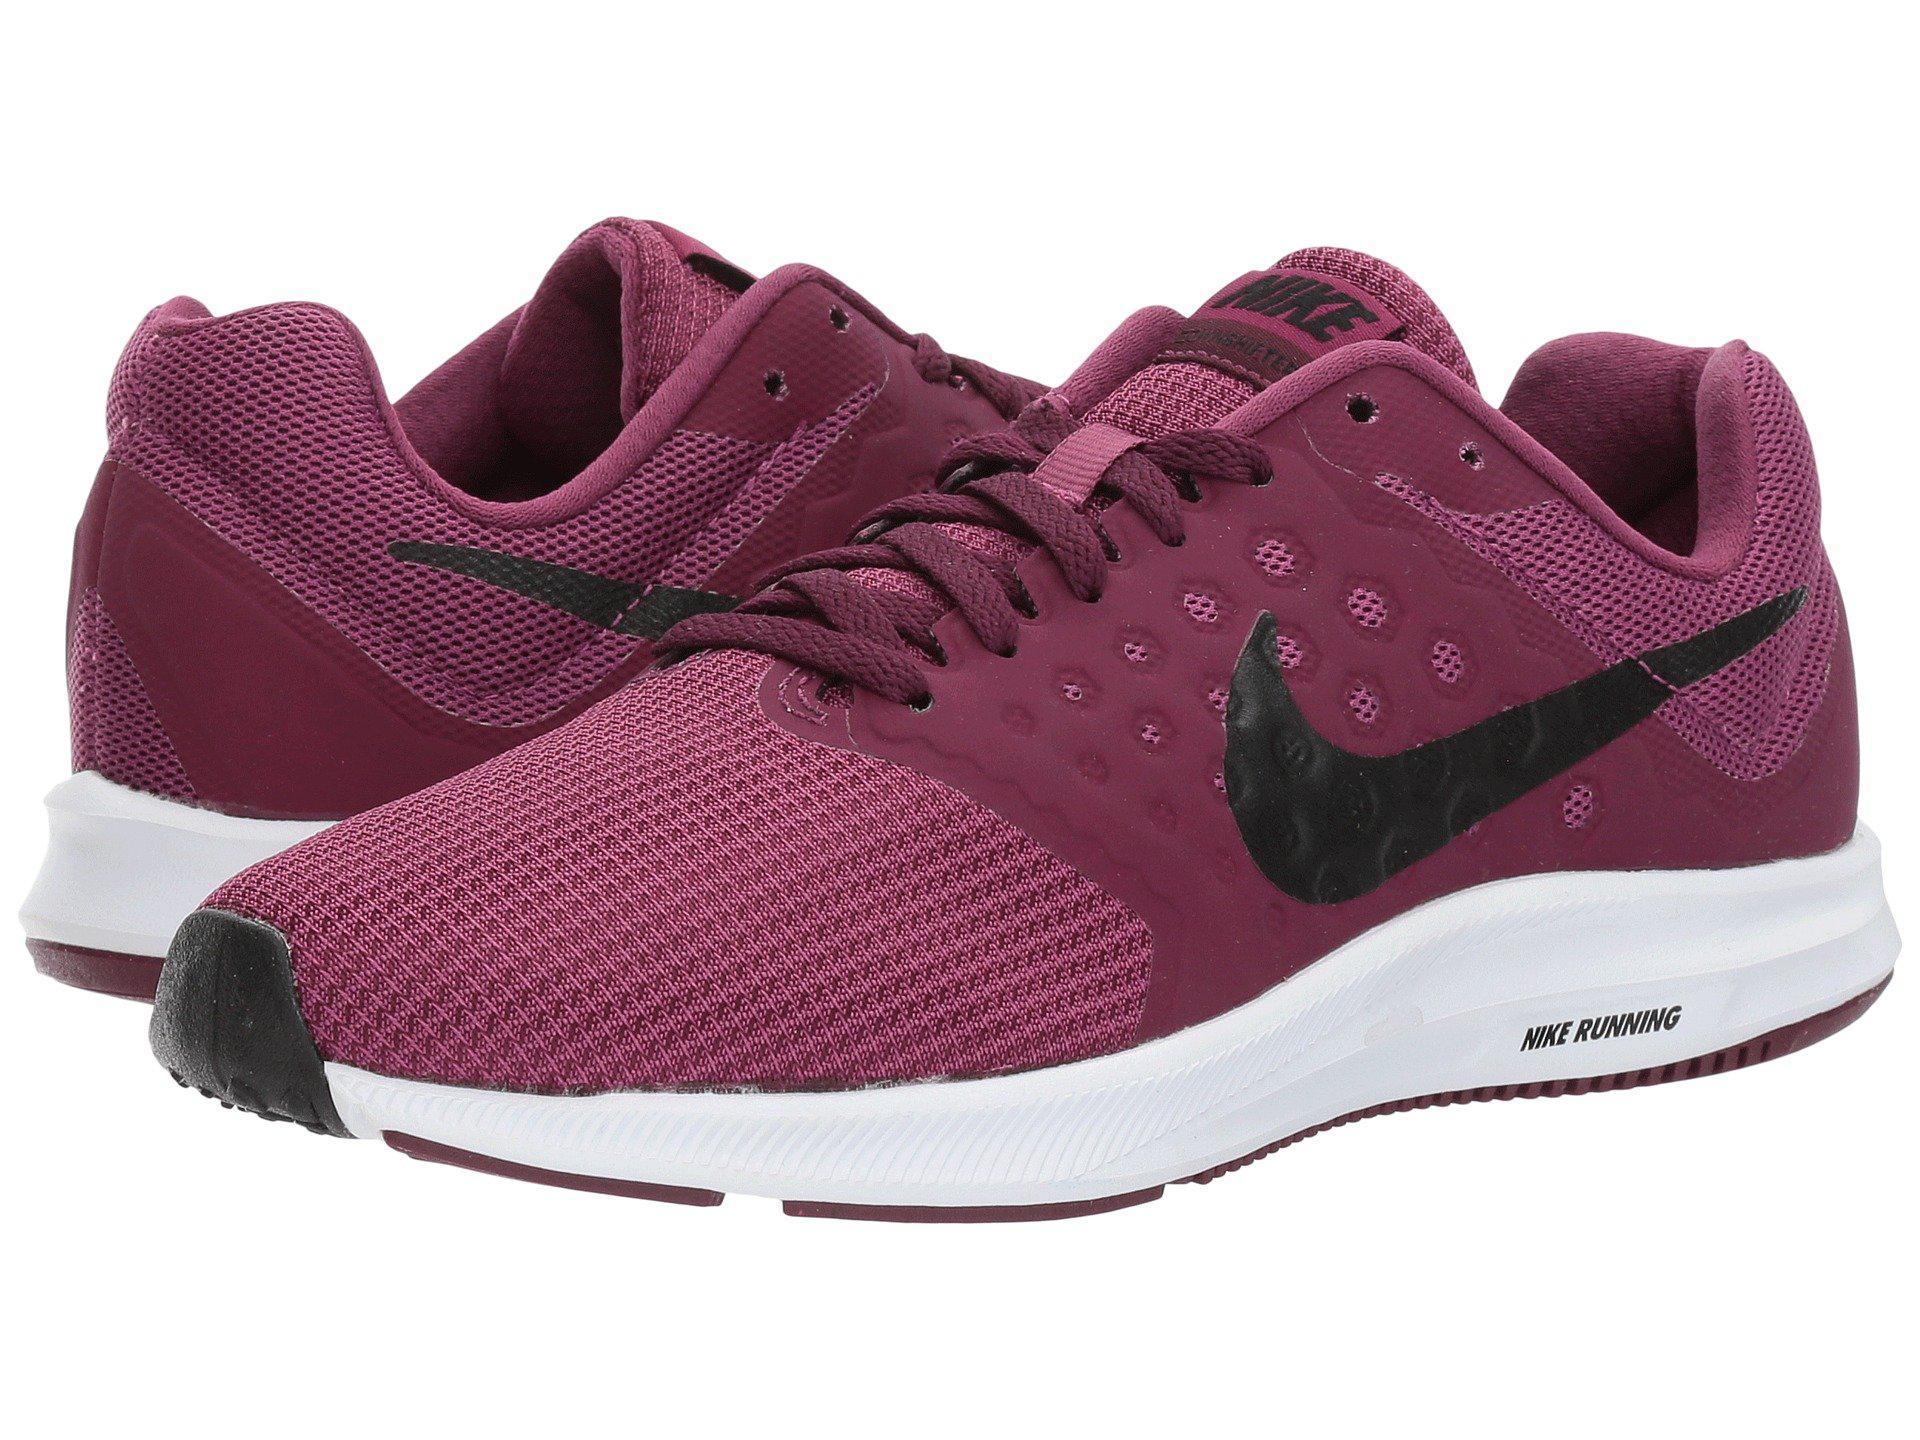 c75cf6a429280 Lyst - Nike Downshifter 7 (tea Berry black bordeaux white) Women s ...